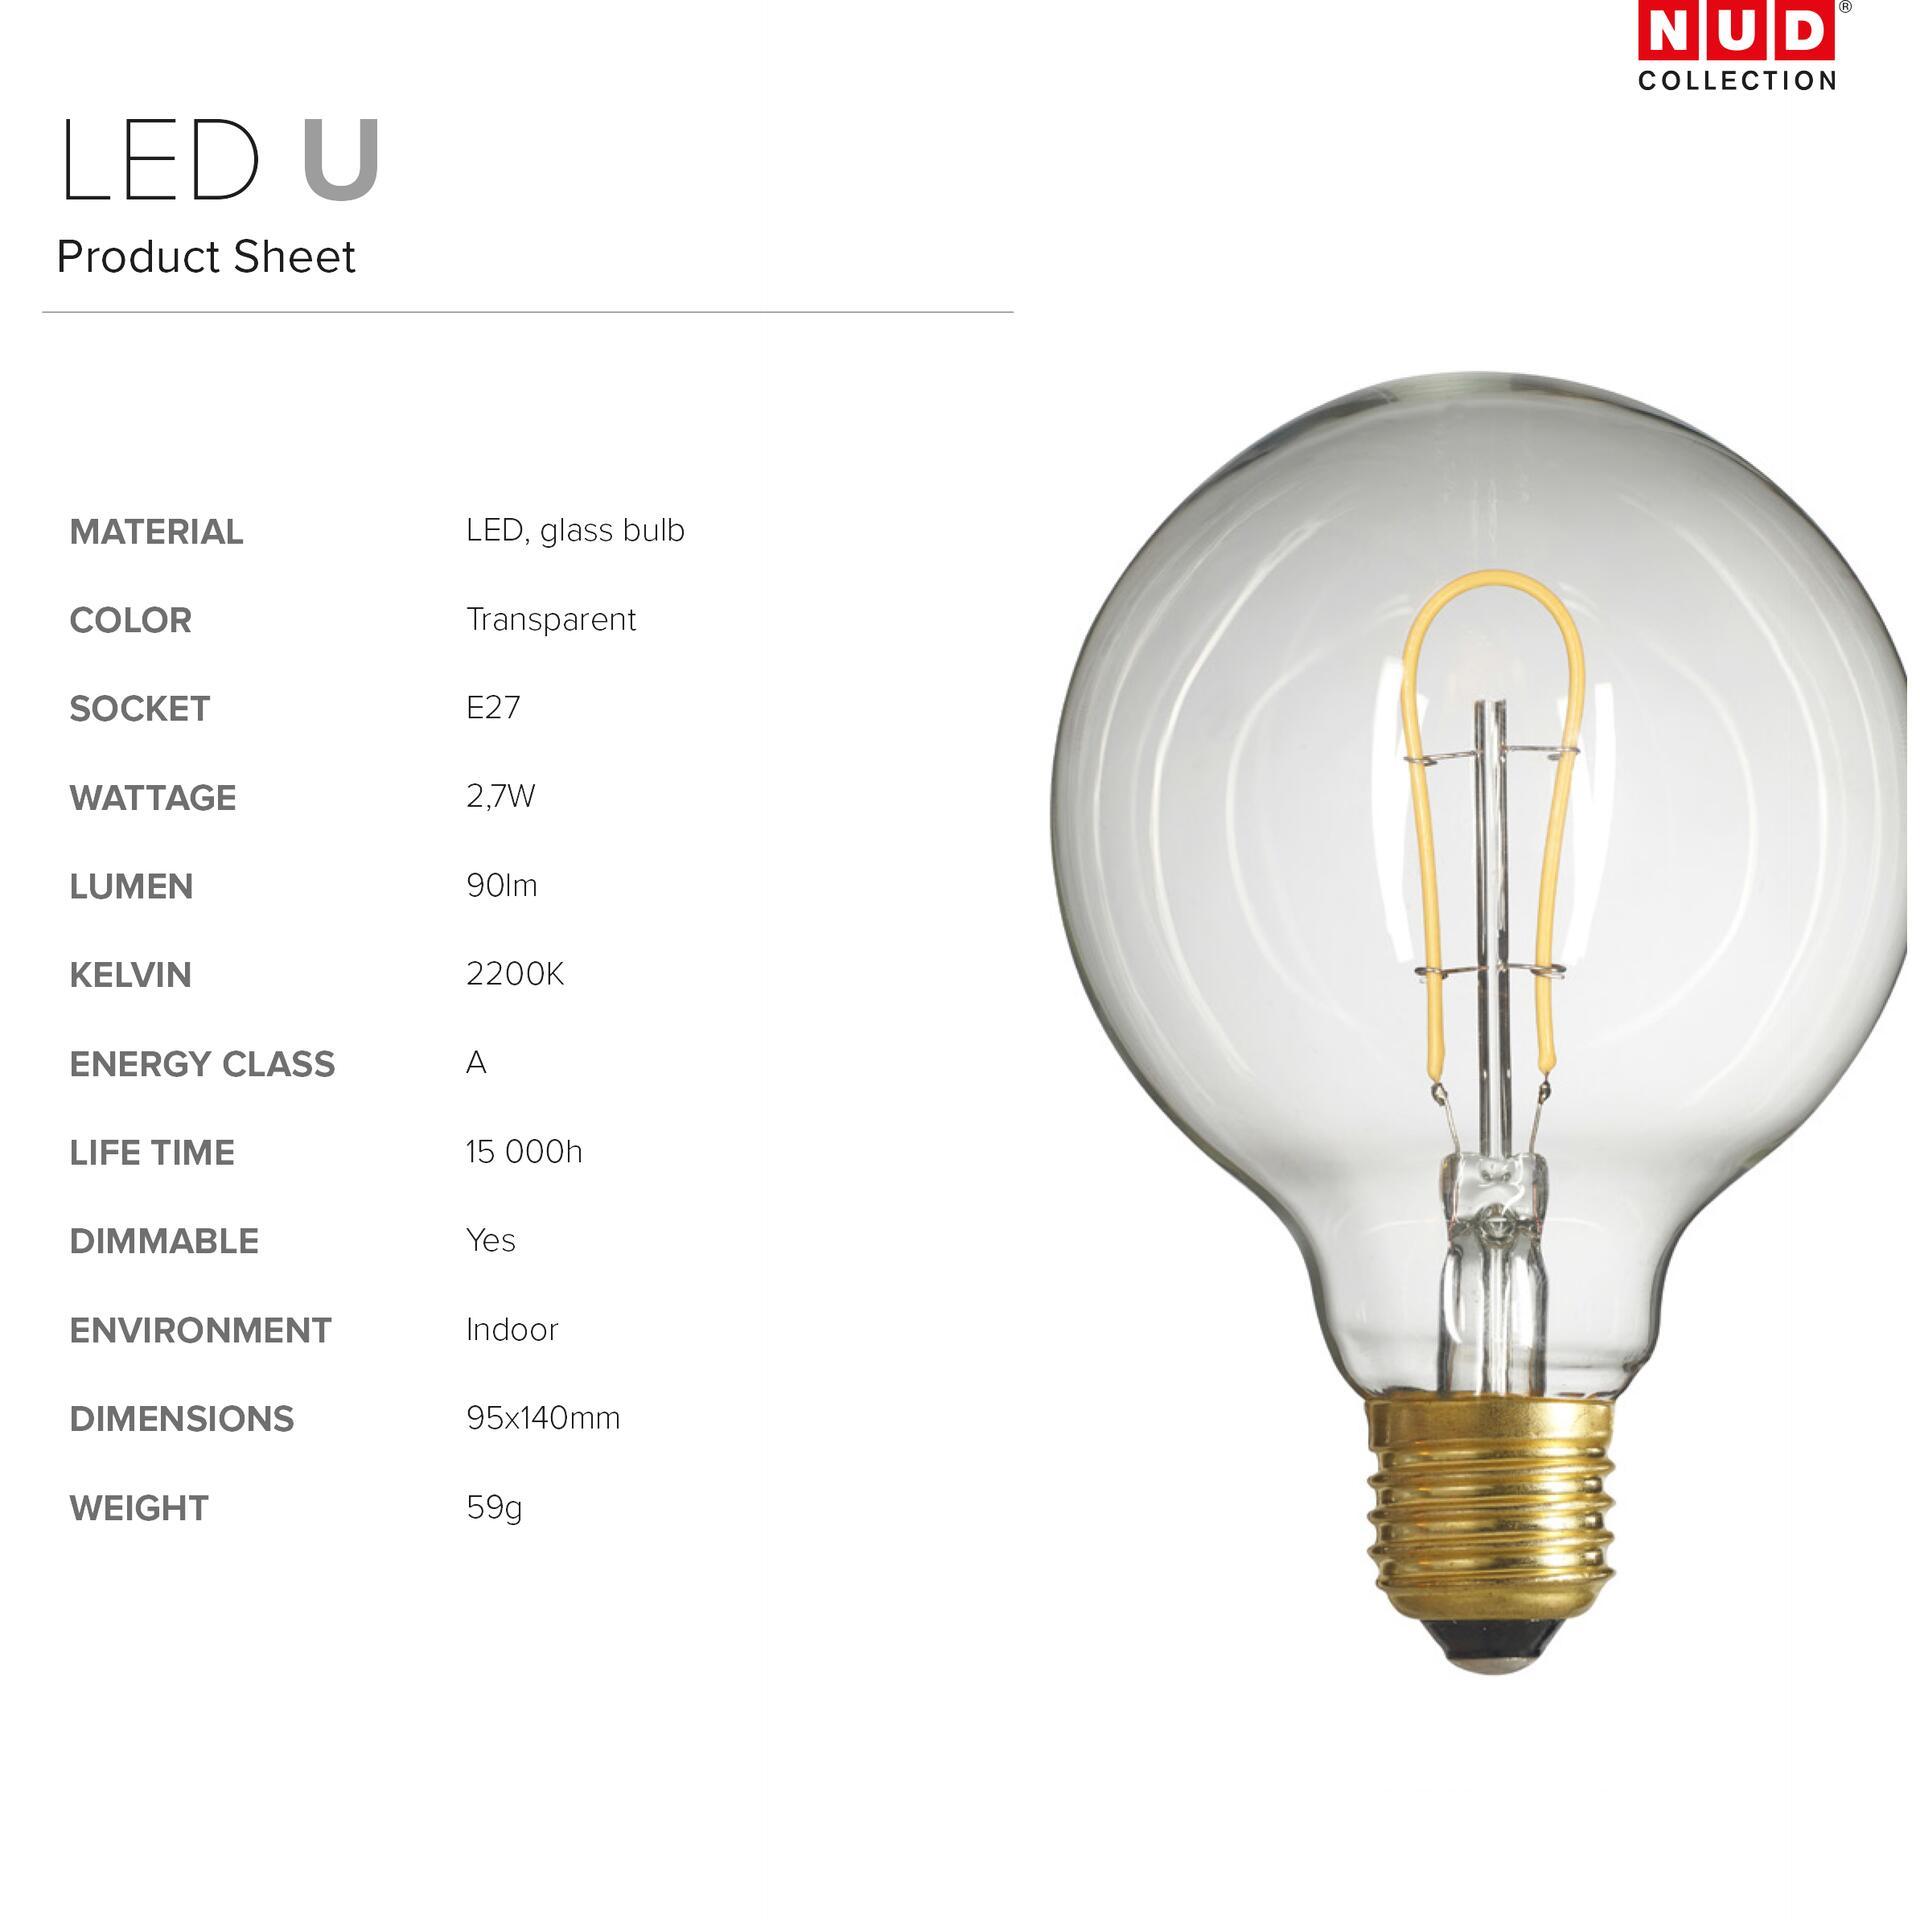 Nud LED Glühbirne Globe 95 mm dimmbar U-förmig